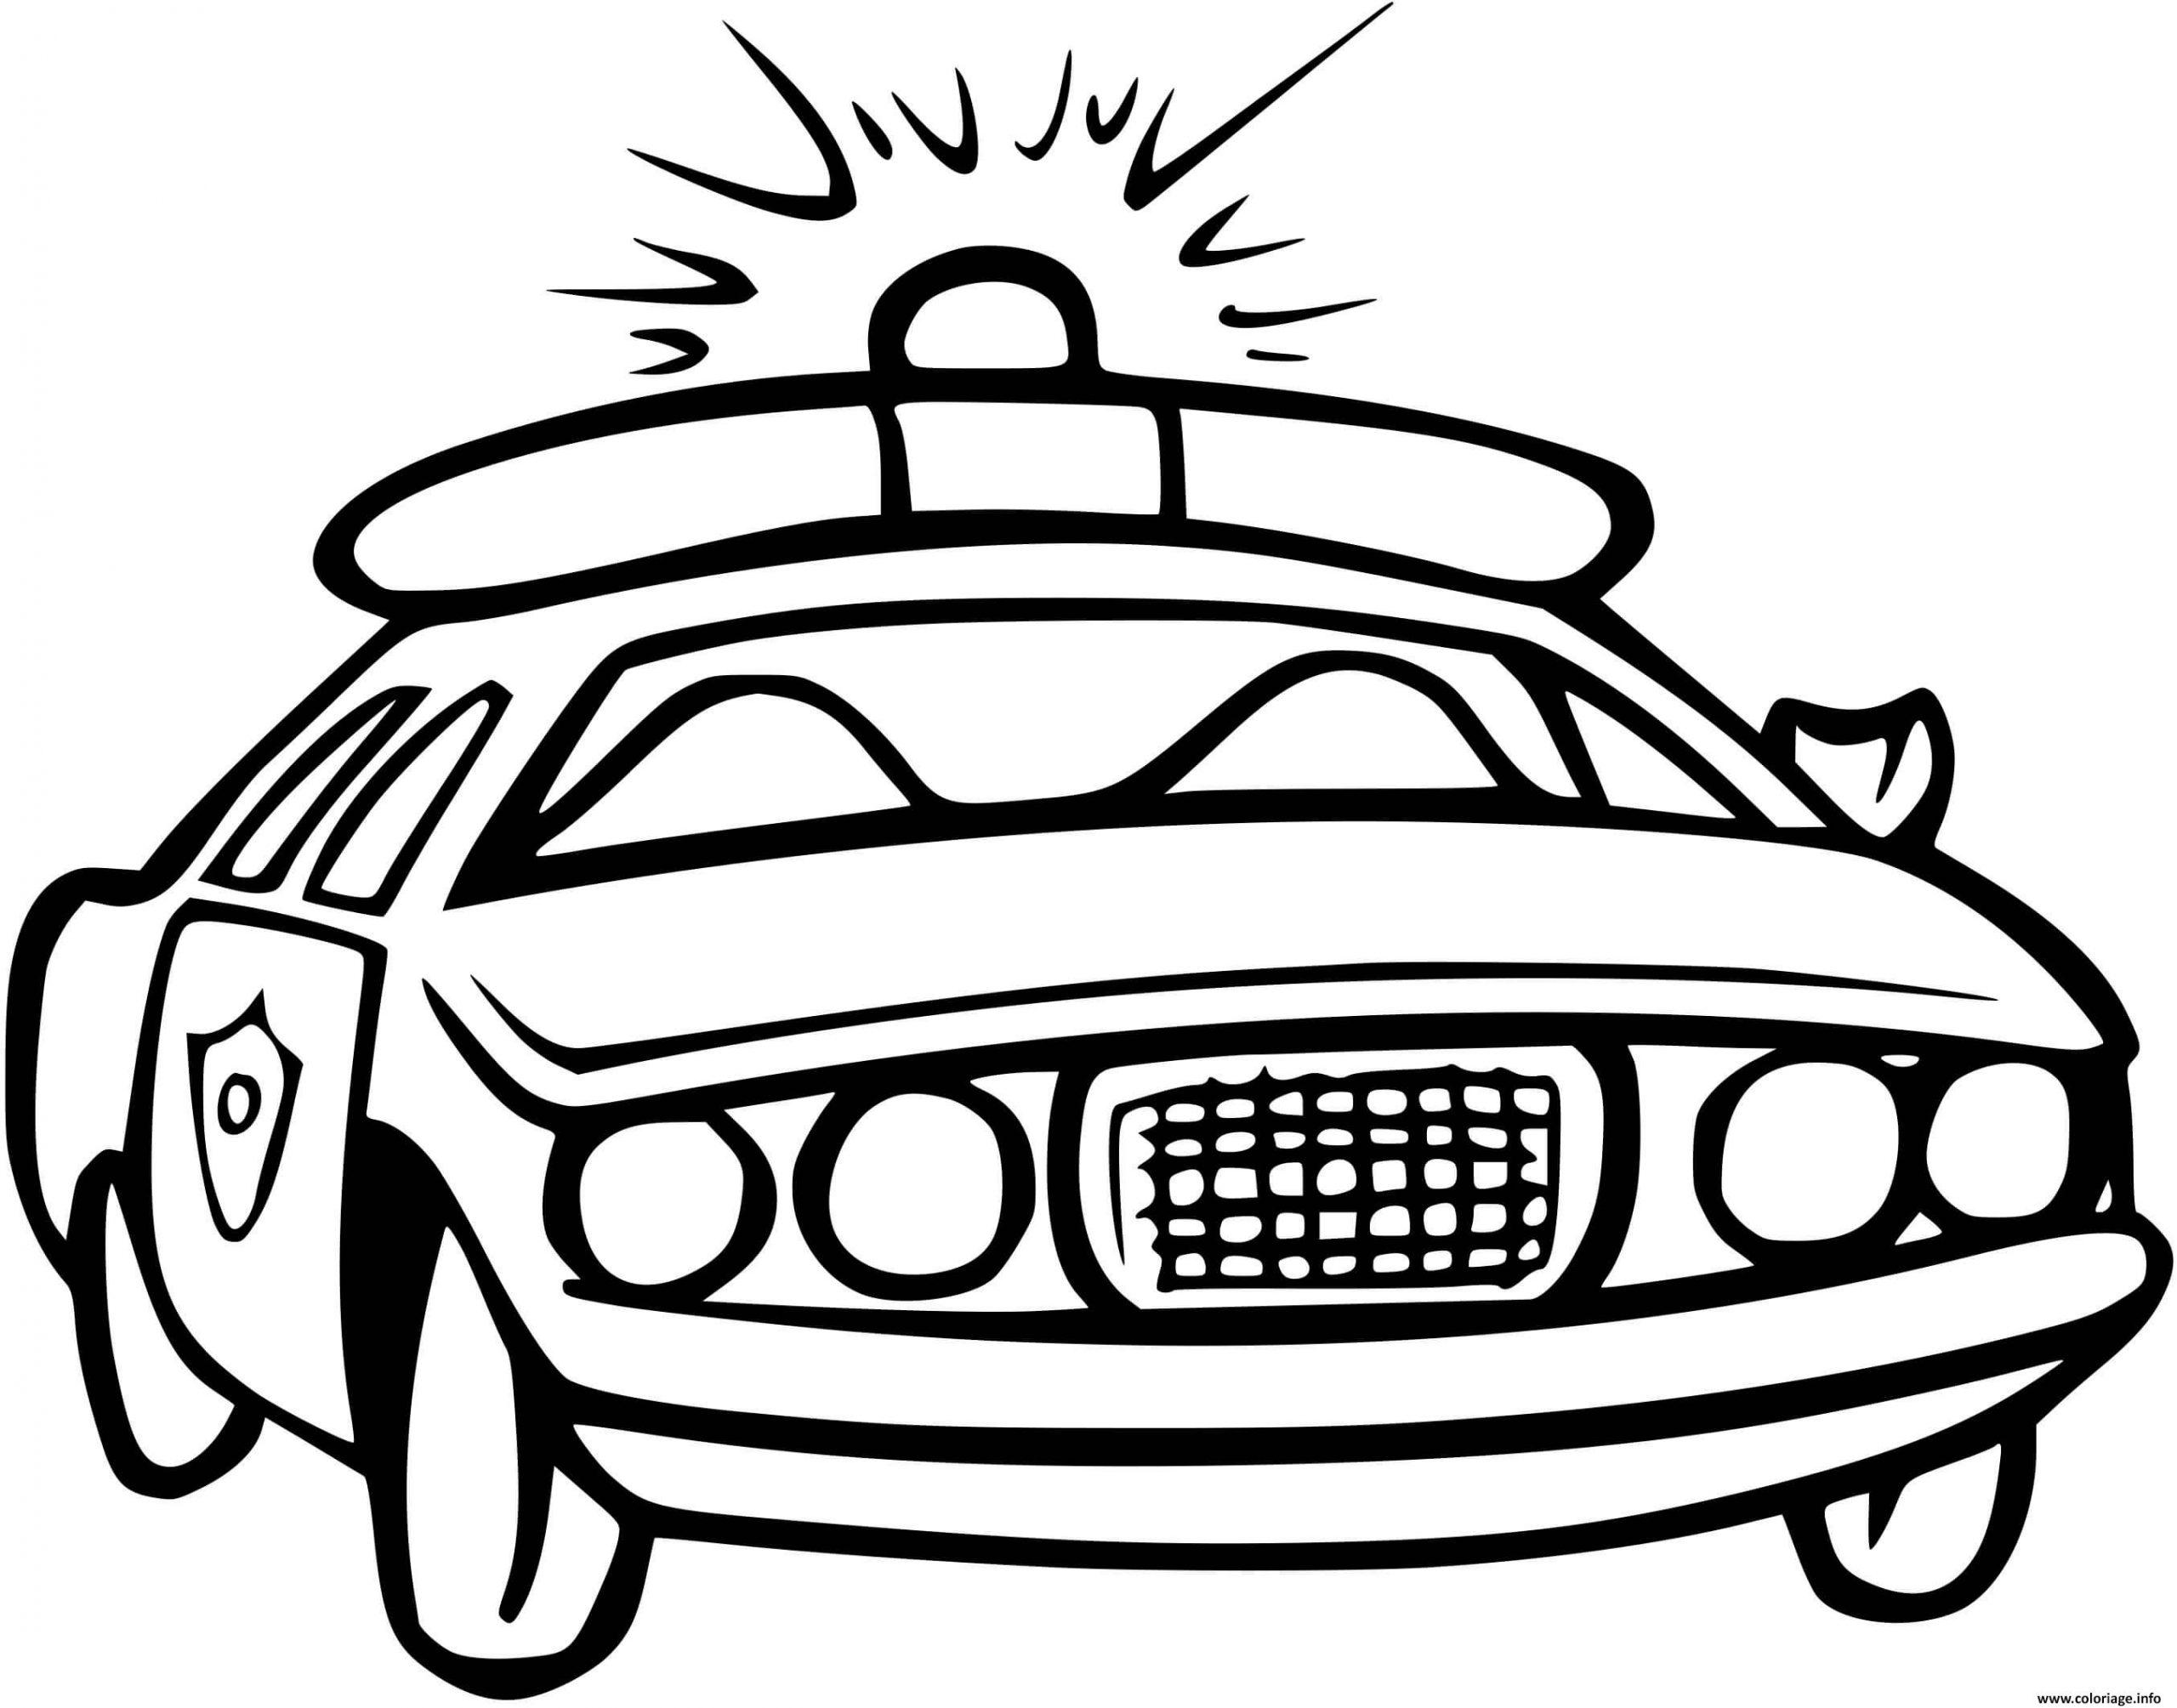 Coloriage Vehicule De Police Canadienne Dessin Voiture De dedans Dessin Voiture De Police A Imprimer